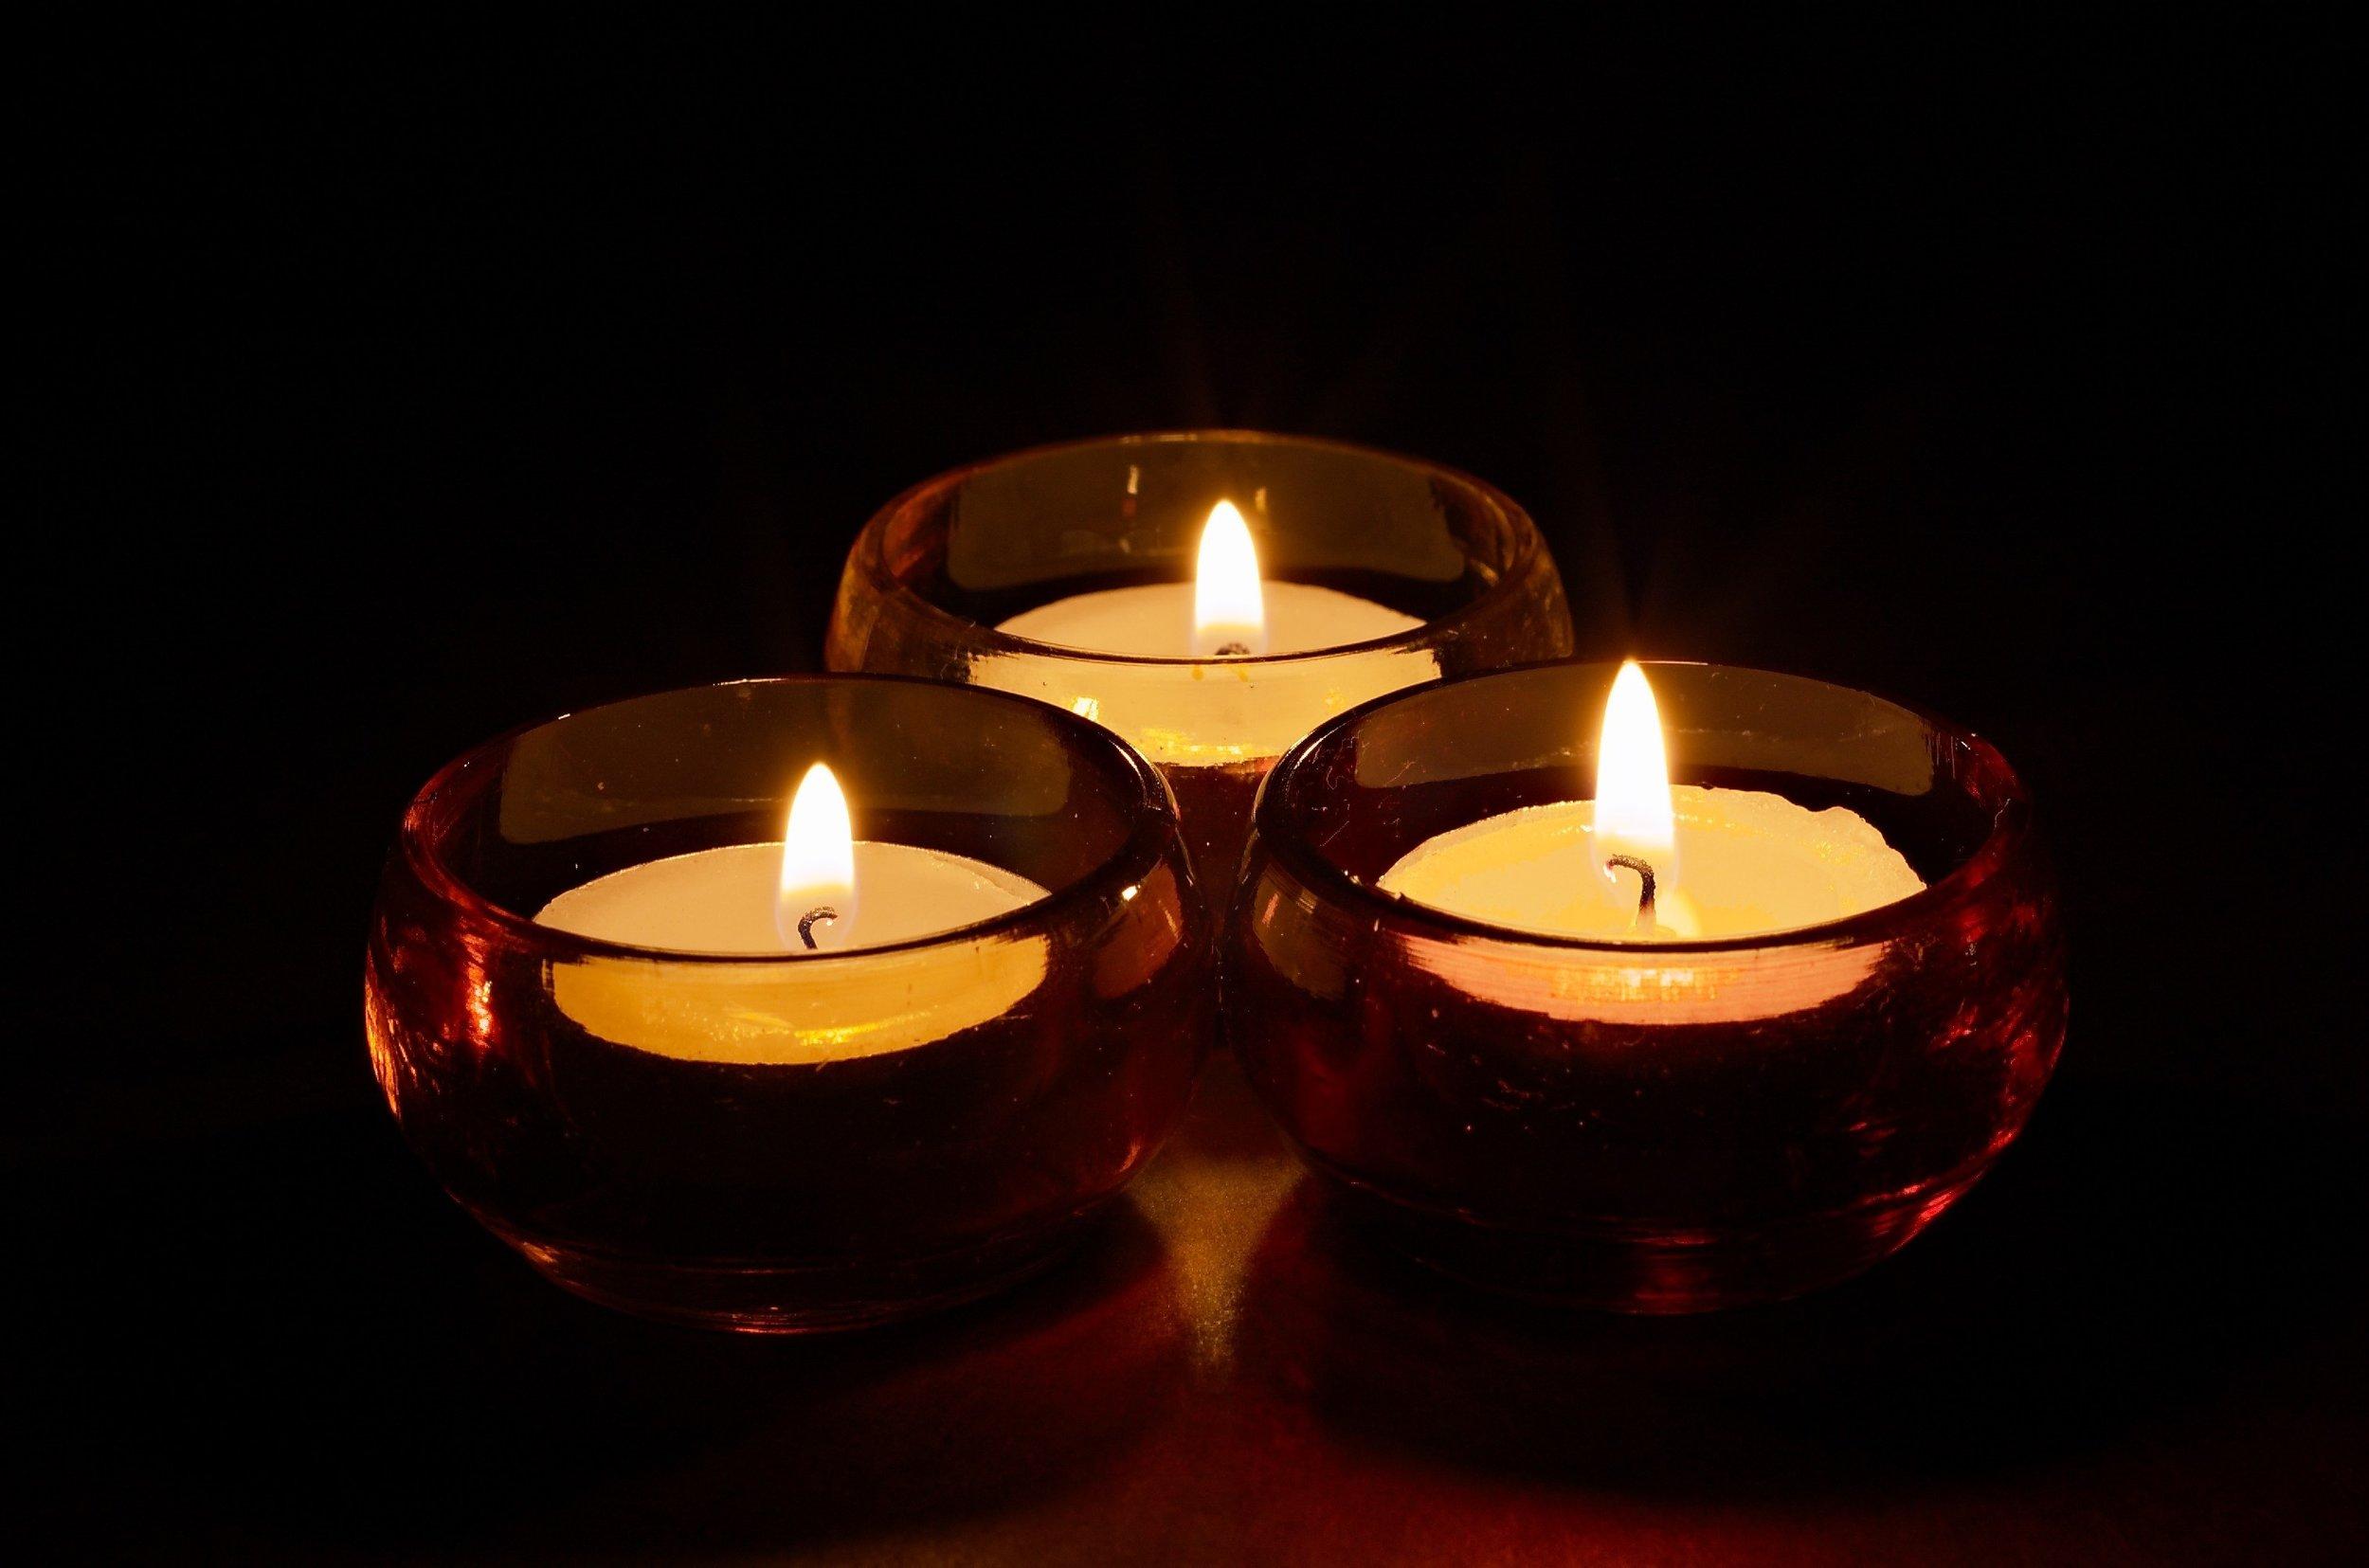 Mindfulness Meditation Candle